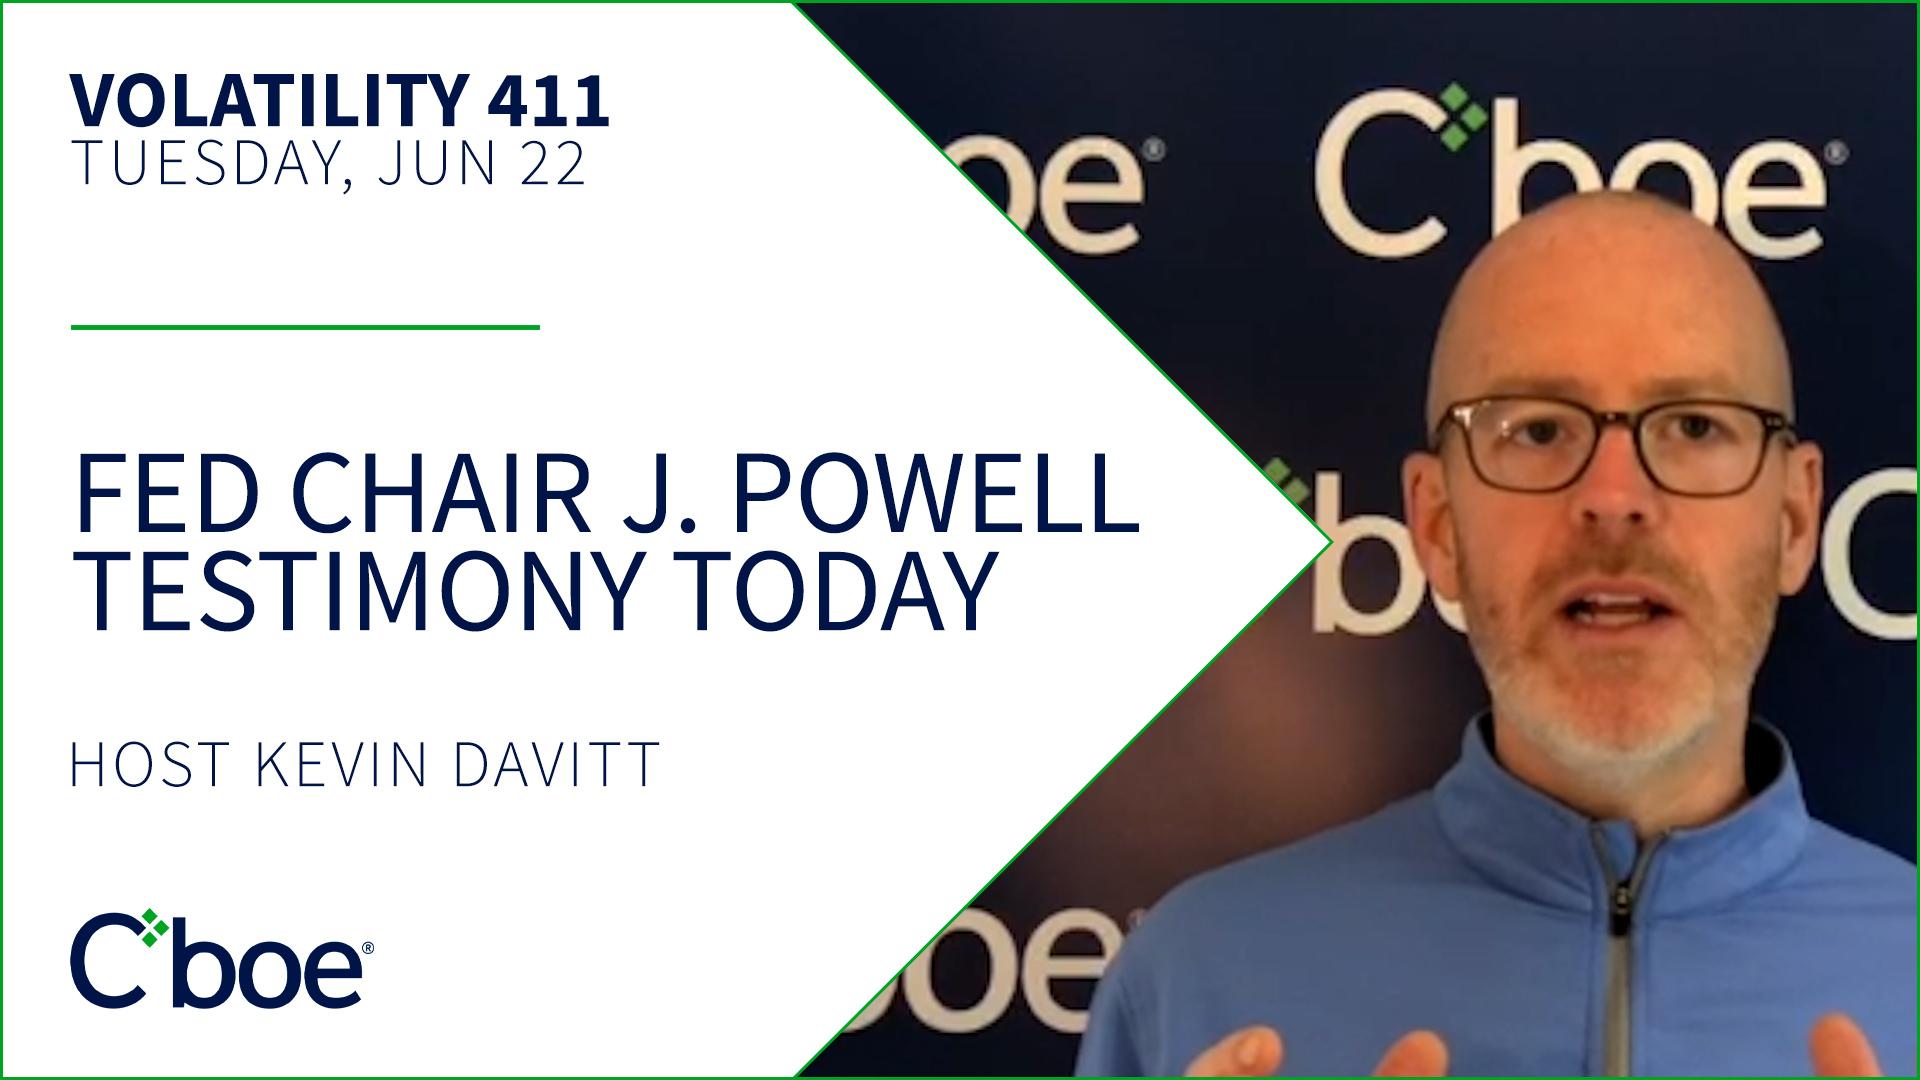 Fed Chair J. Powell Testimony Today Thumbnail